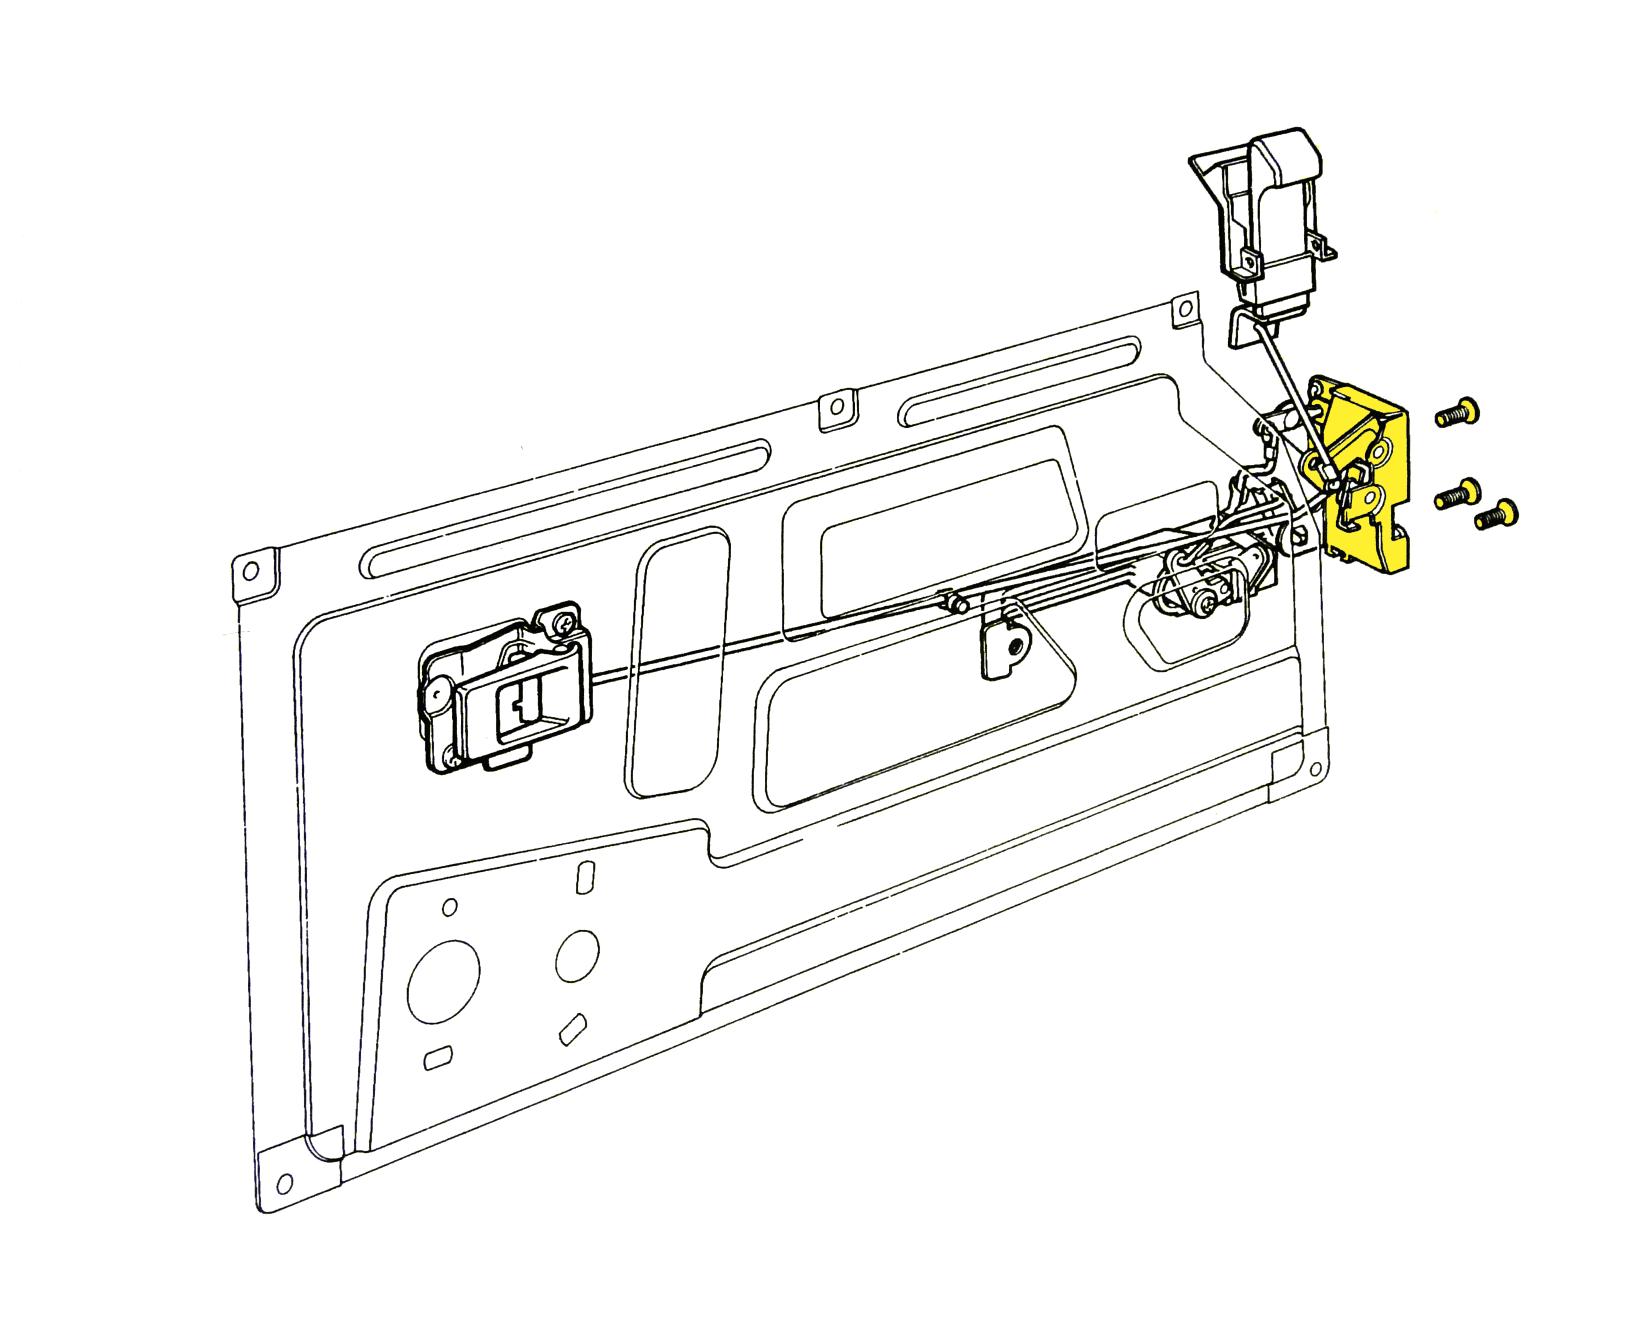 Ask LRO: Whats the problem with 90s door lock? — LRO